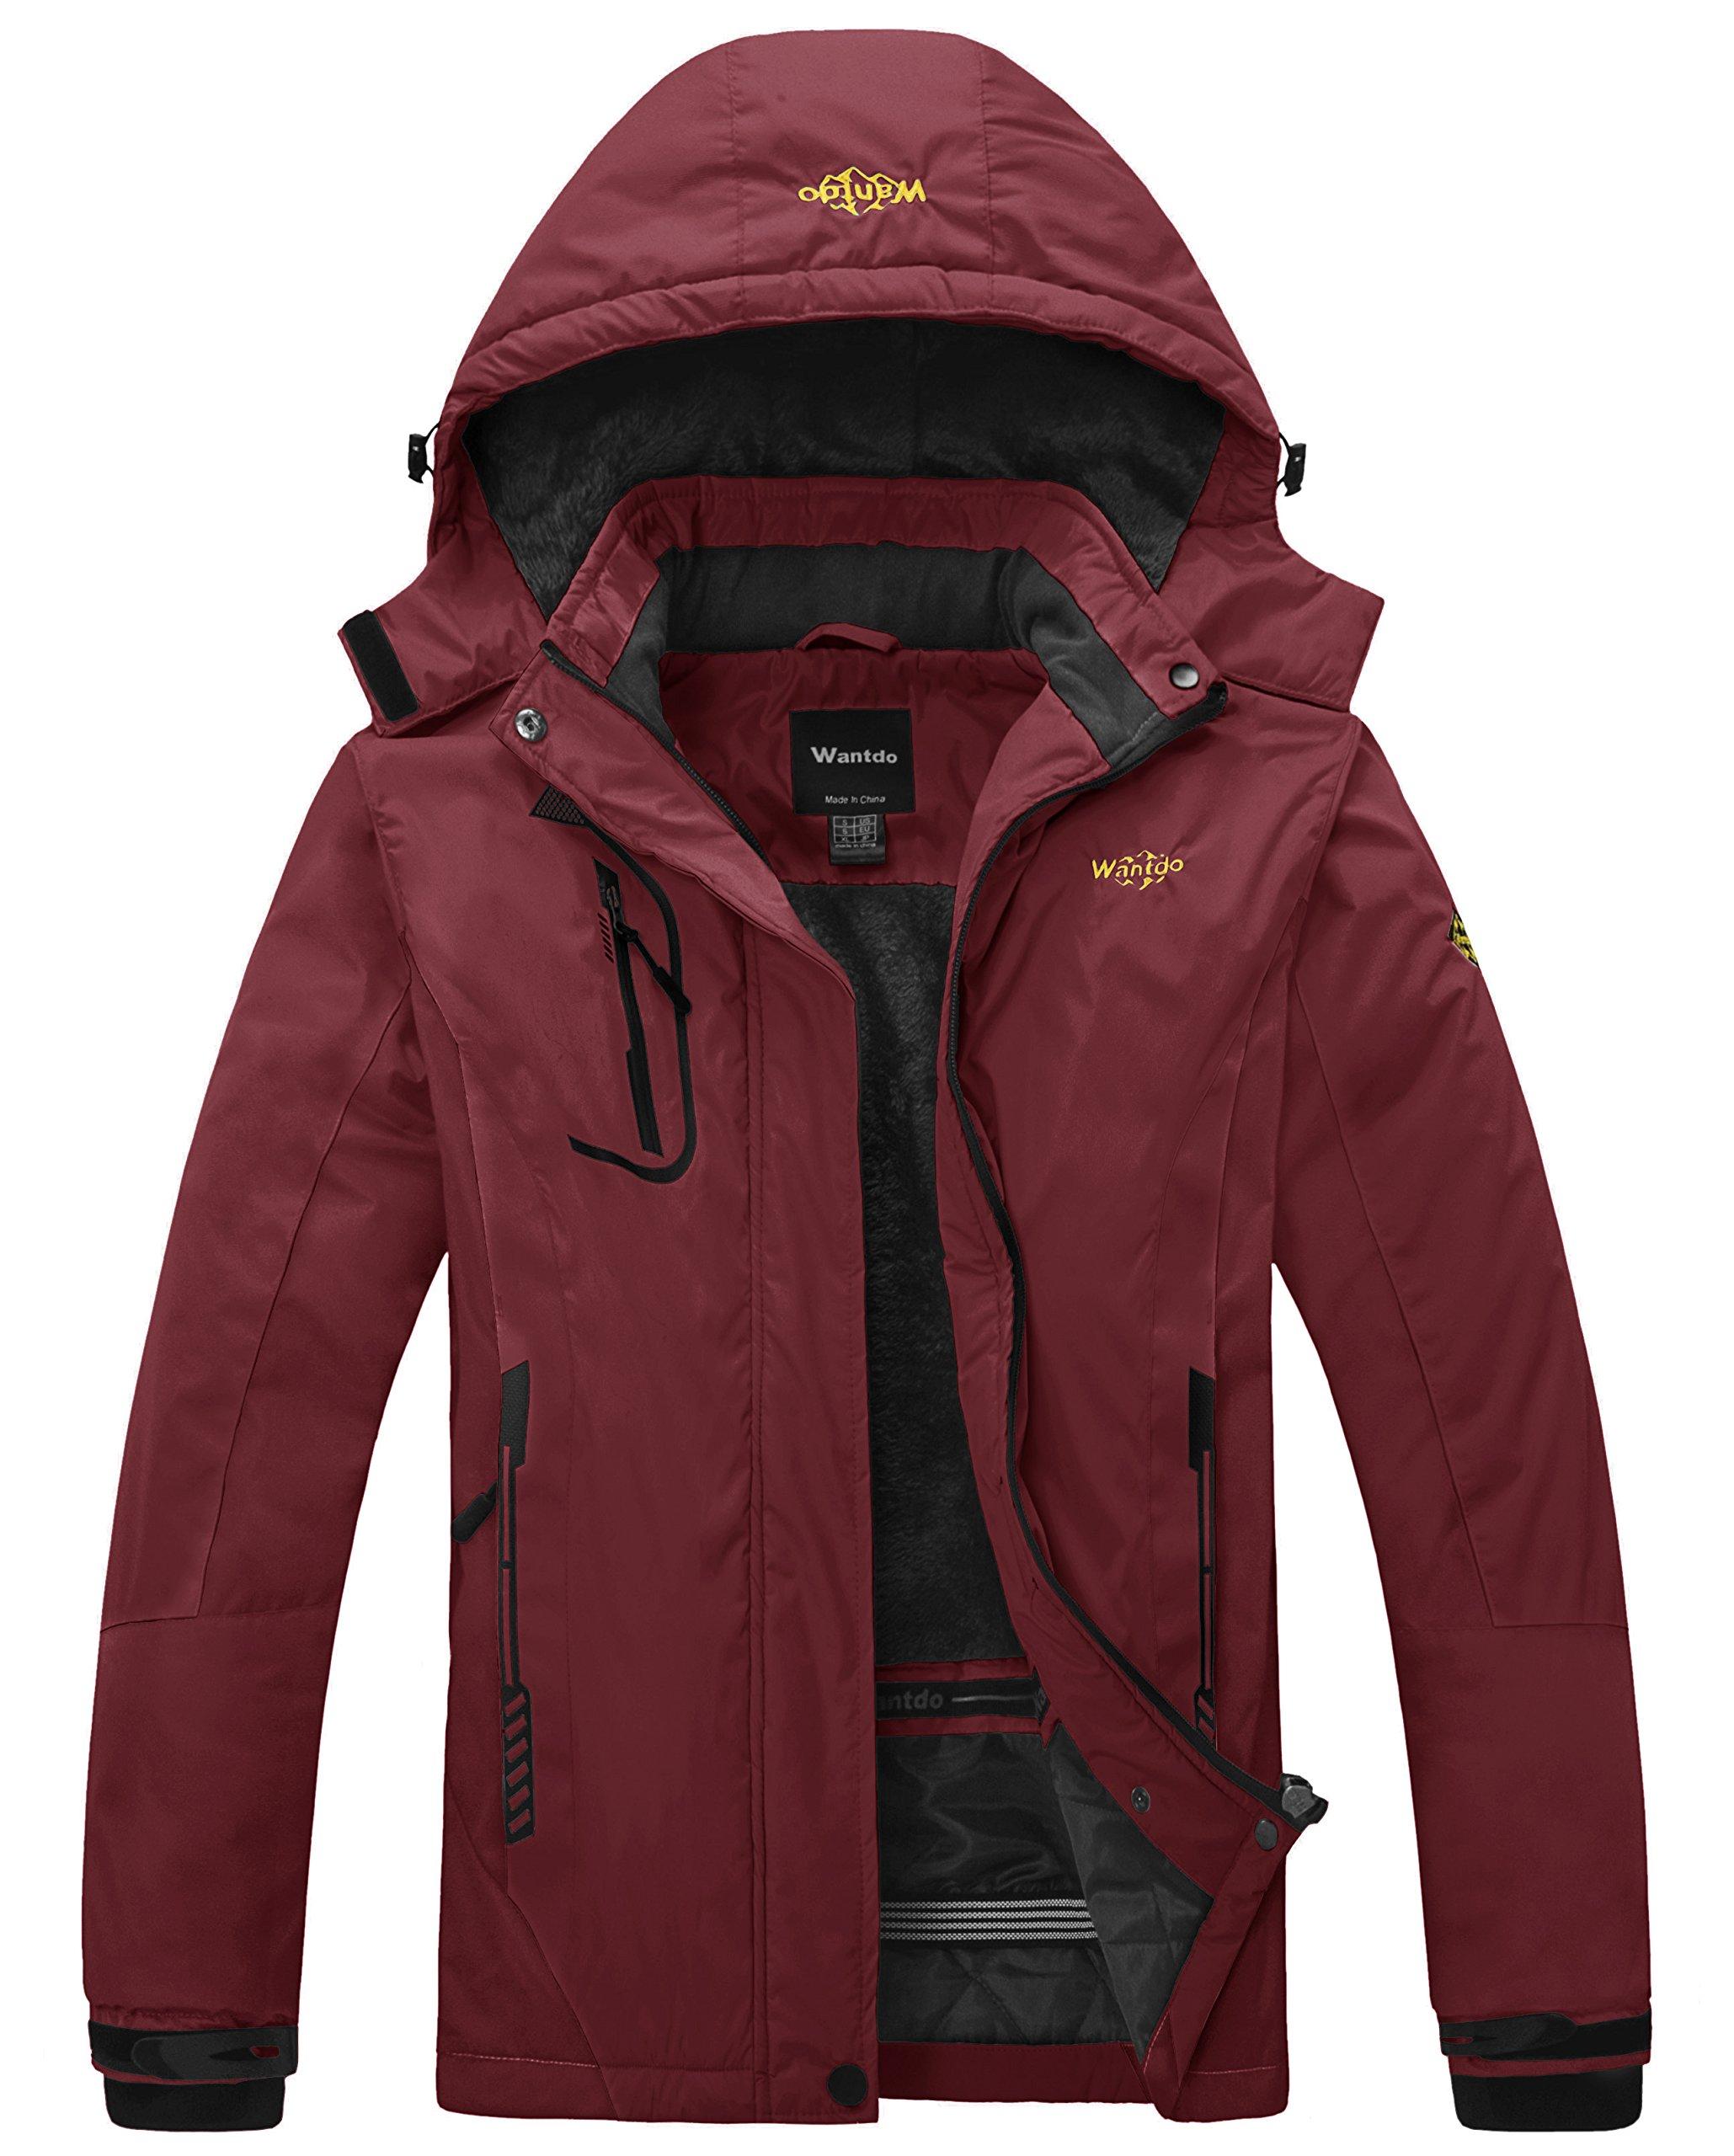 Wantdo Girls Warm Snowboarding Jackets Waterproof Ski Jacket Fleece Winter Snow Coat Windproof Raincoats